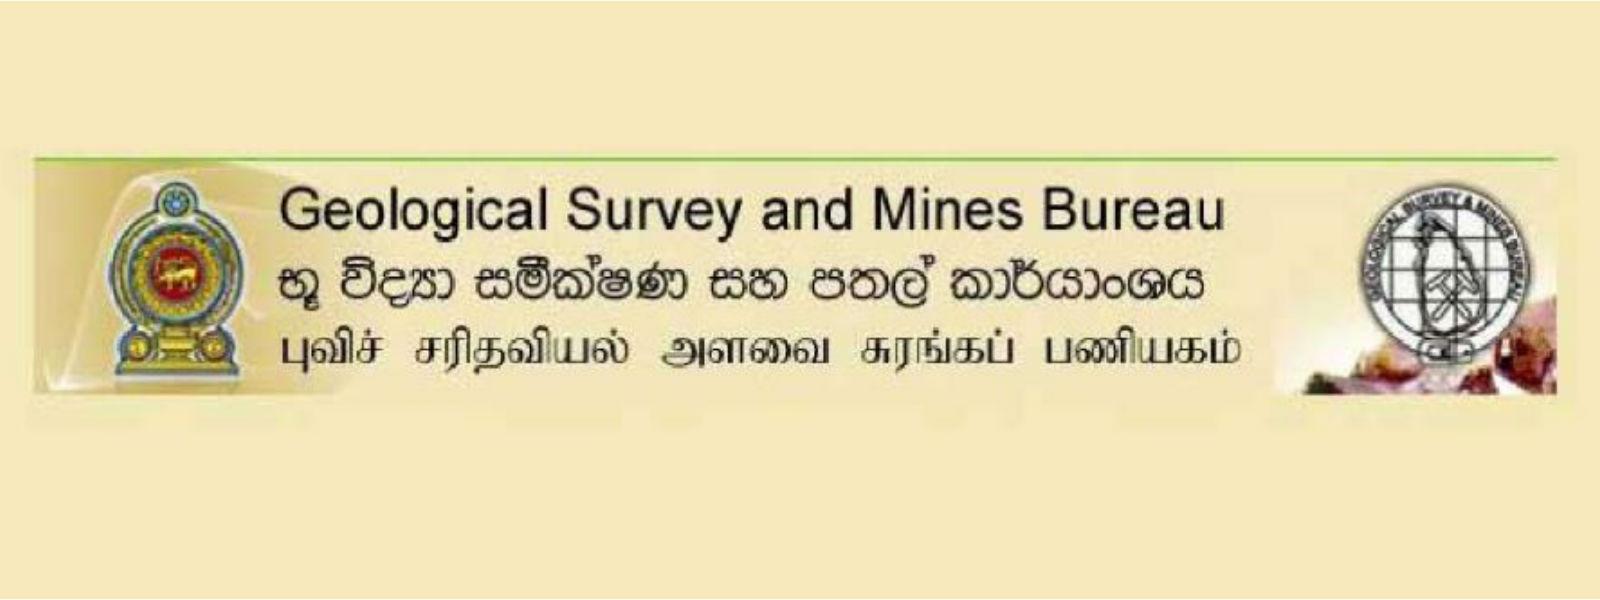 Geological Survey and Mines Bureau - Sri Lanka Tamil News - Newsfirst    News1st   newsfirst.lk   Breaking